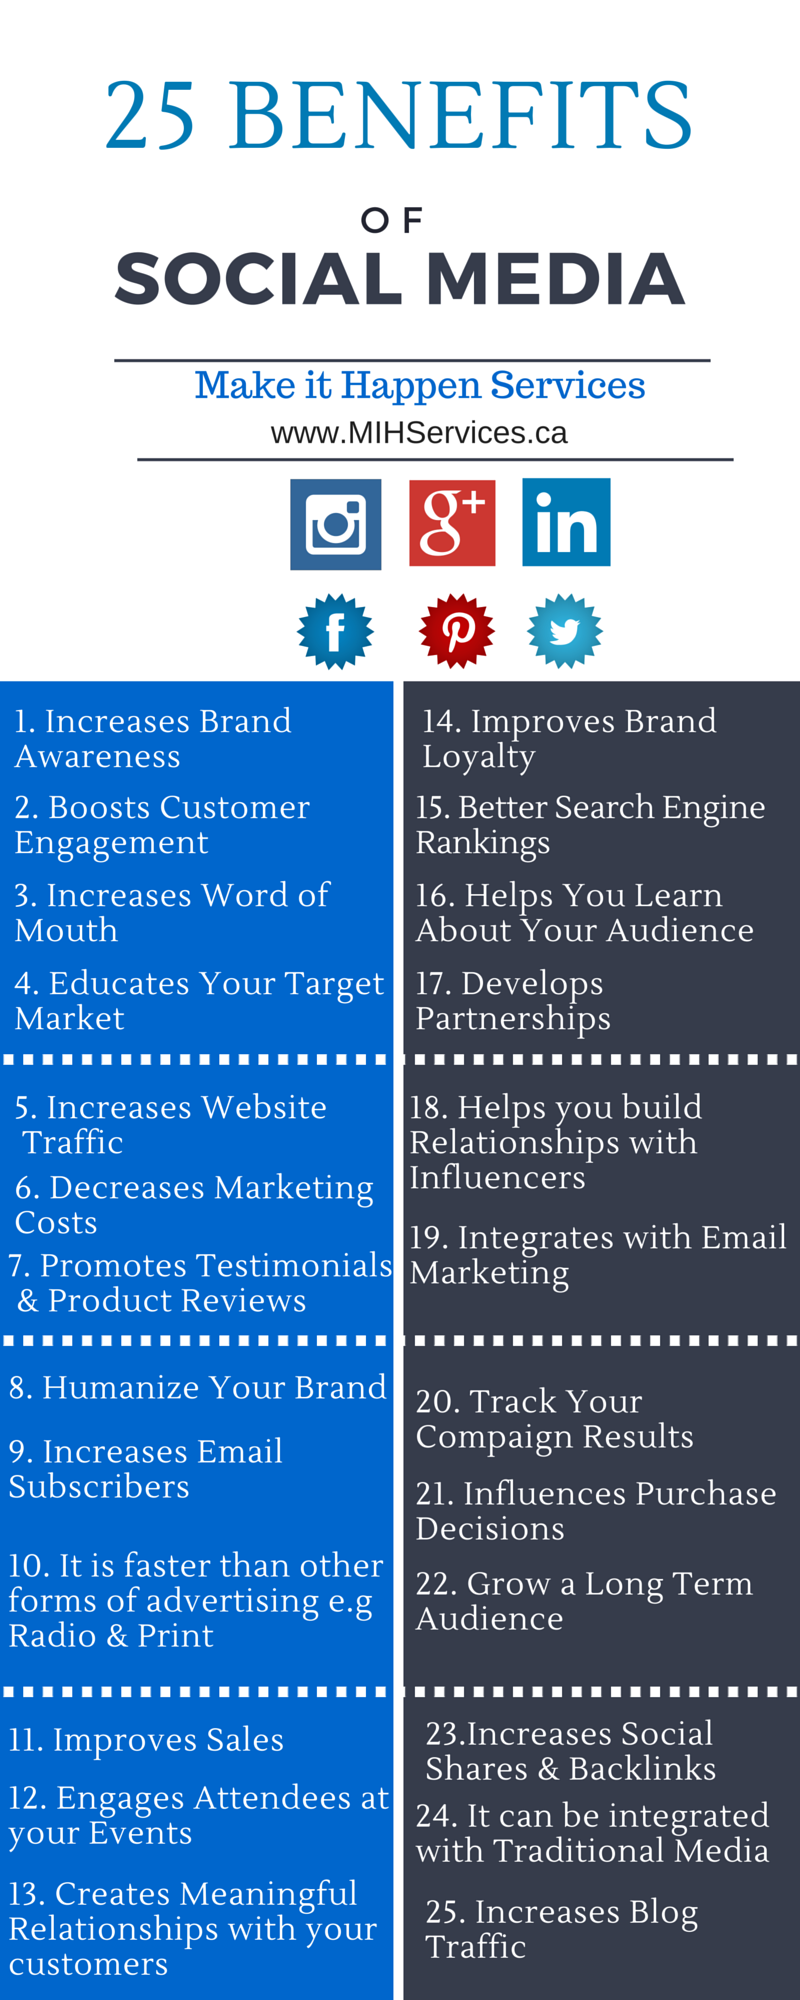 25 Benefits of Social Media